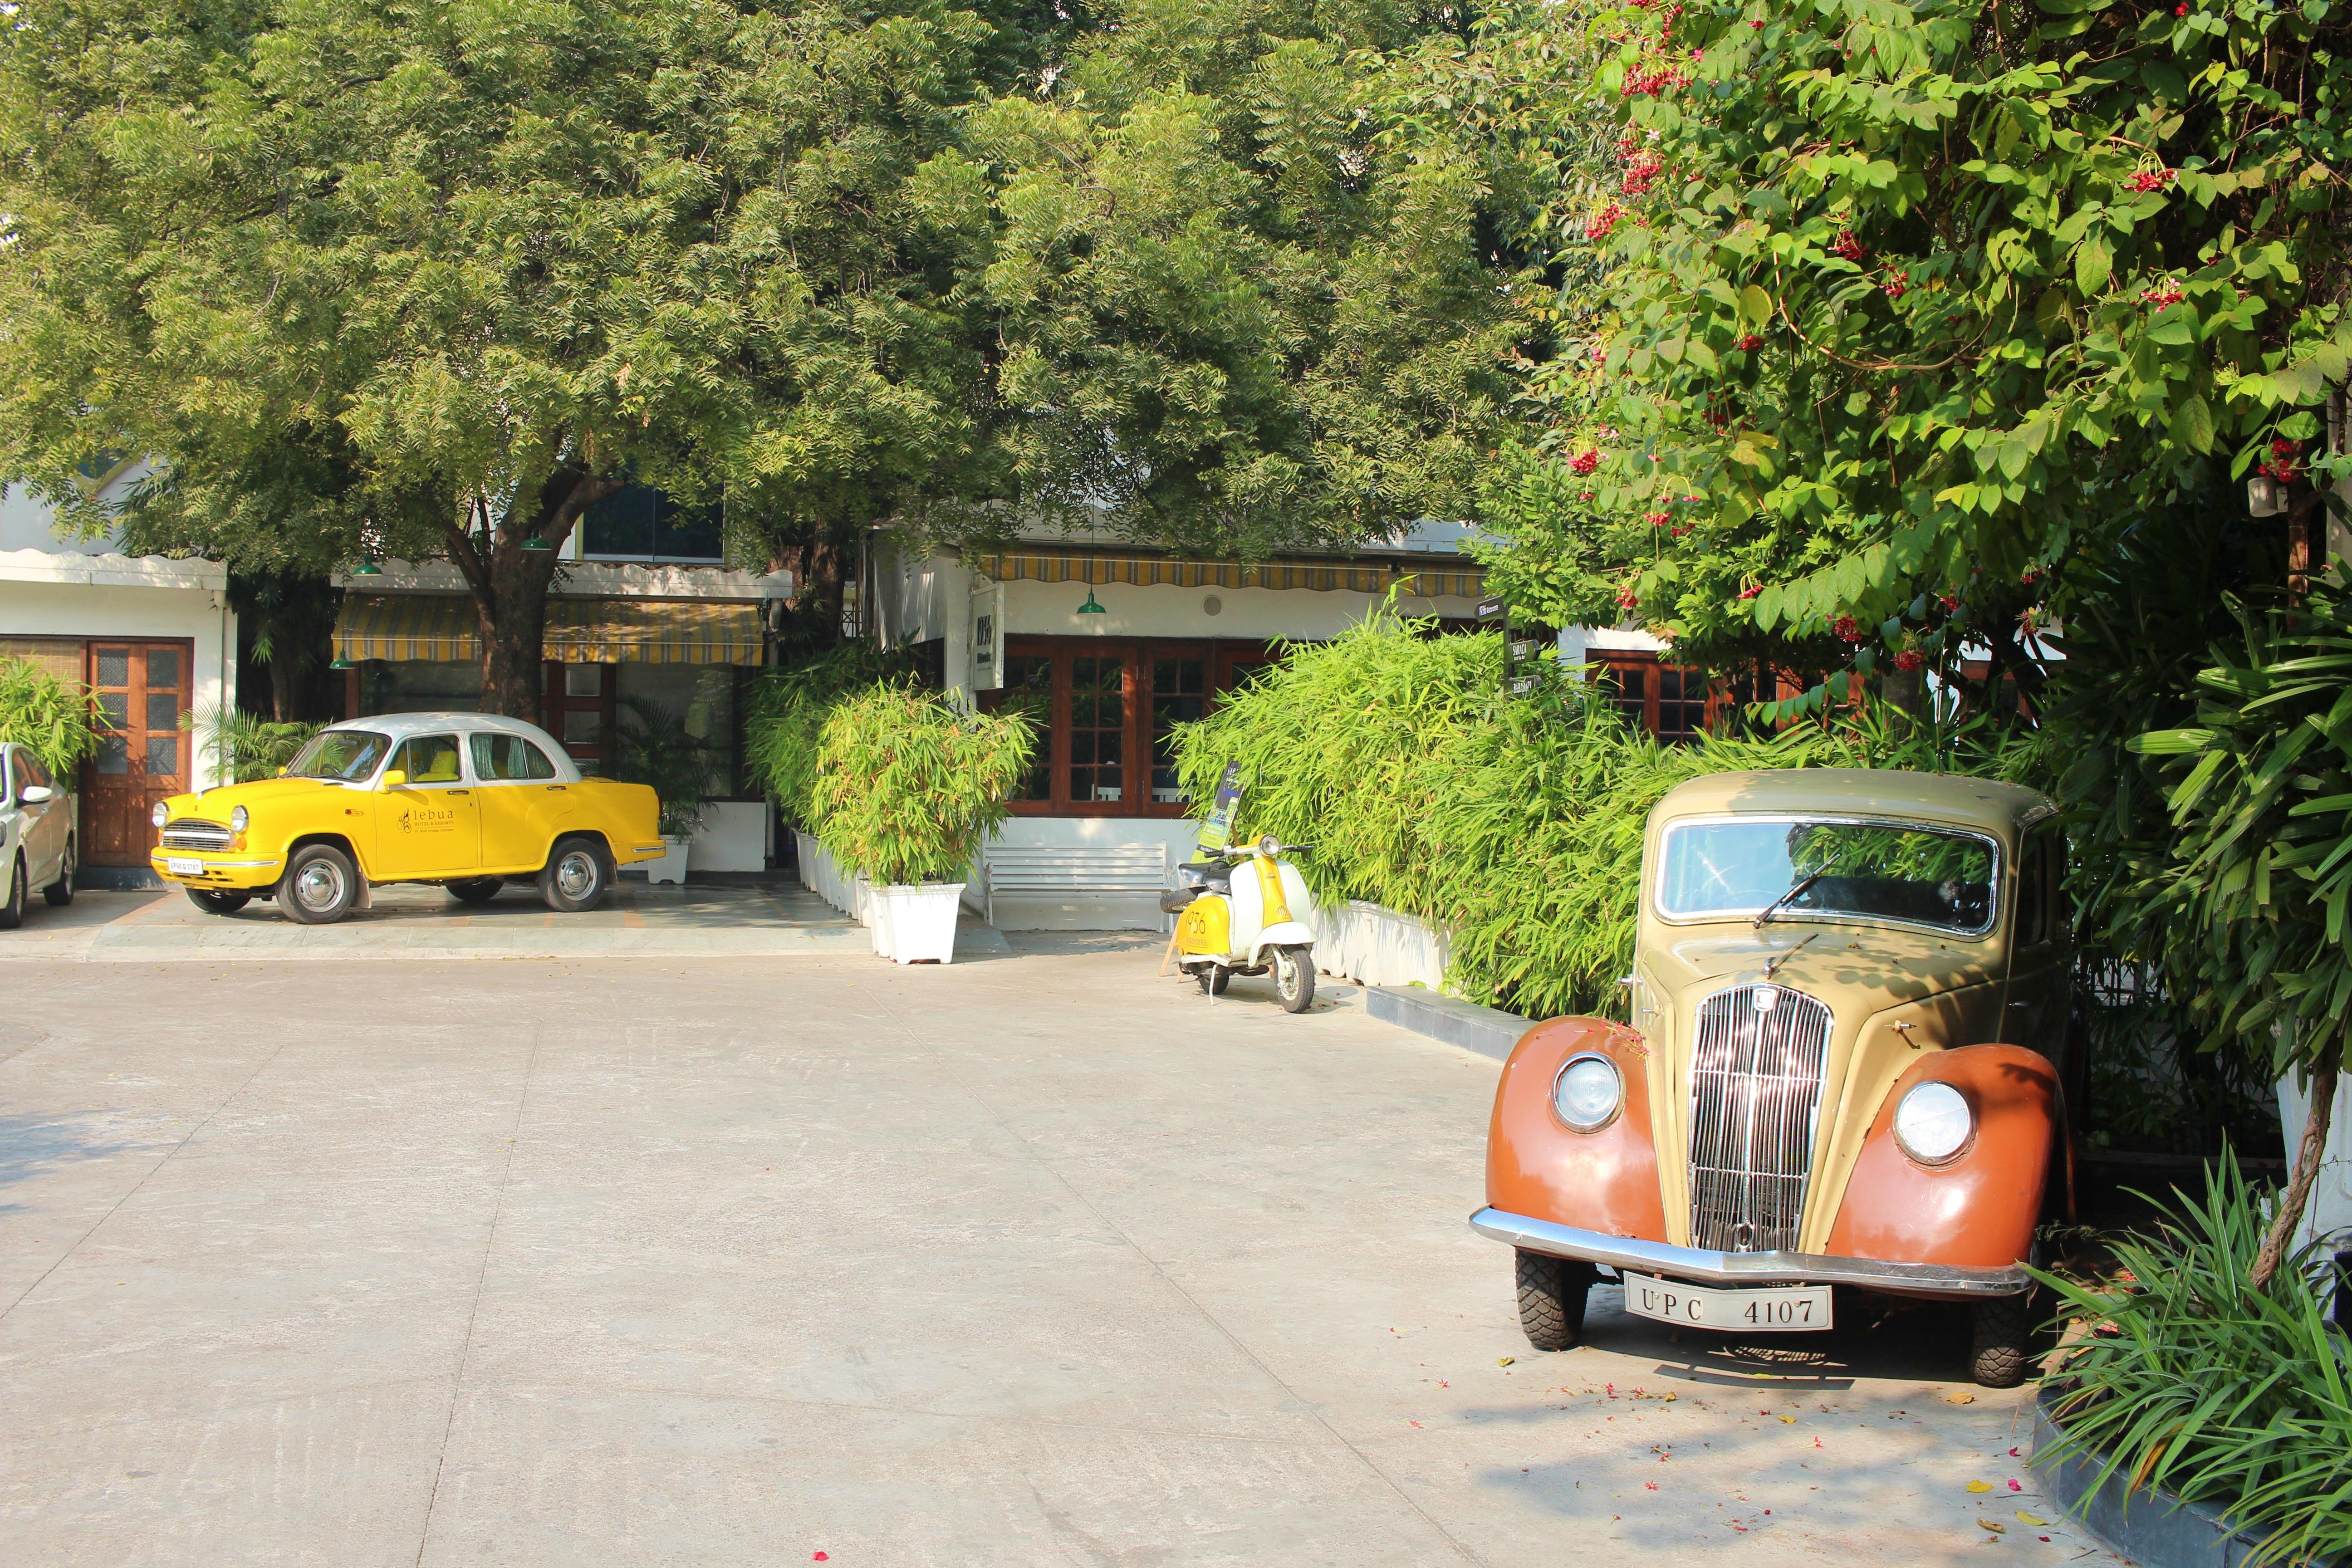 berserk, vintage, lebua, lucknow, uttar pradesh, india